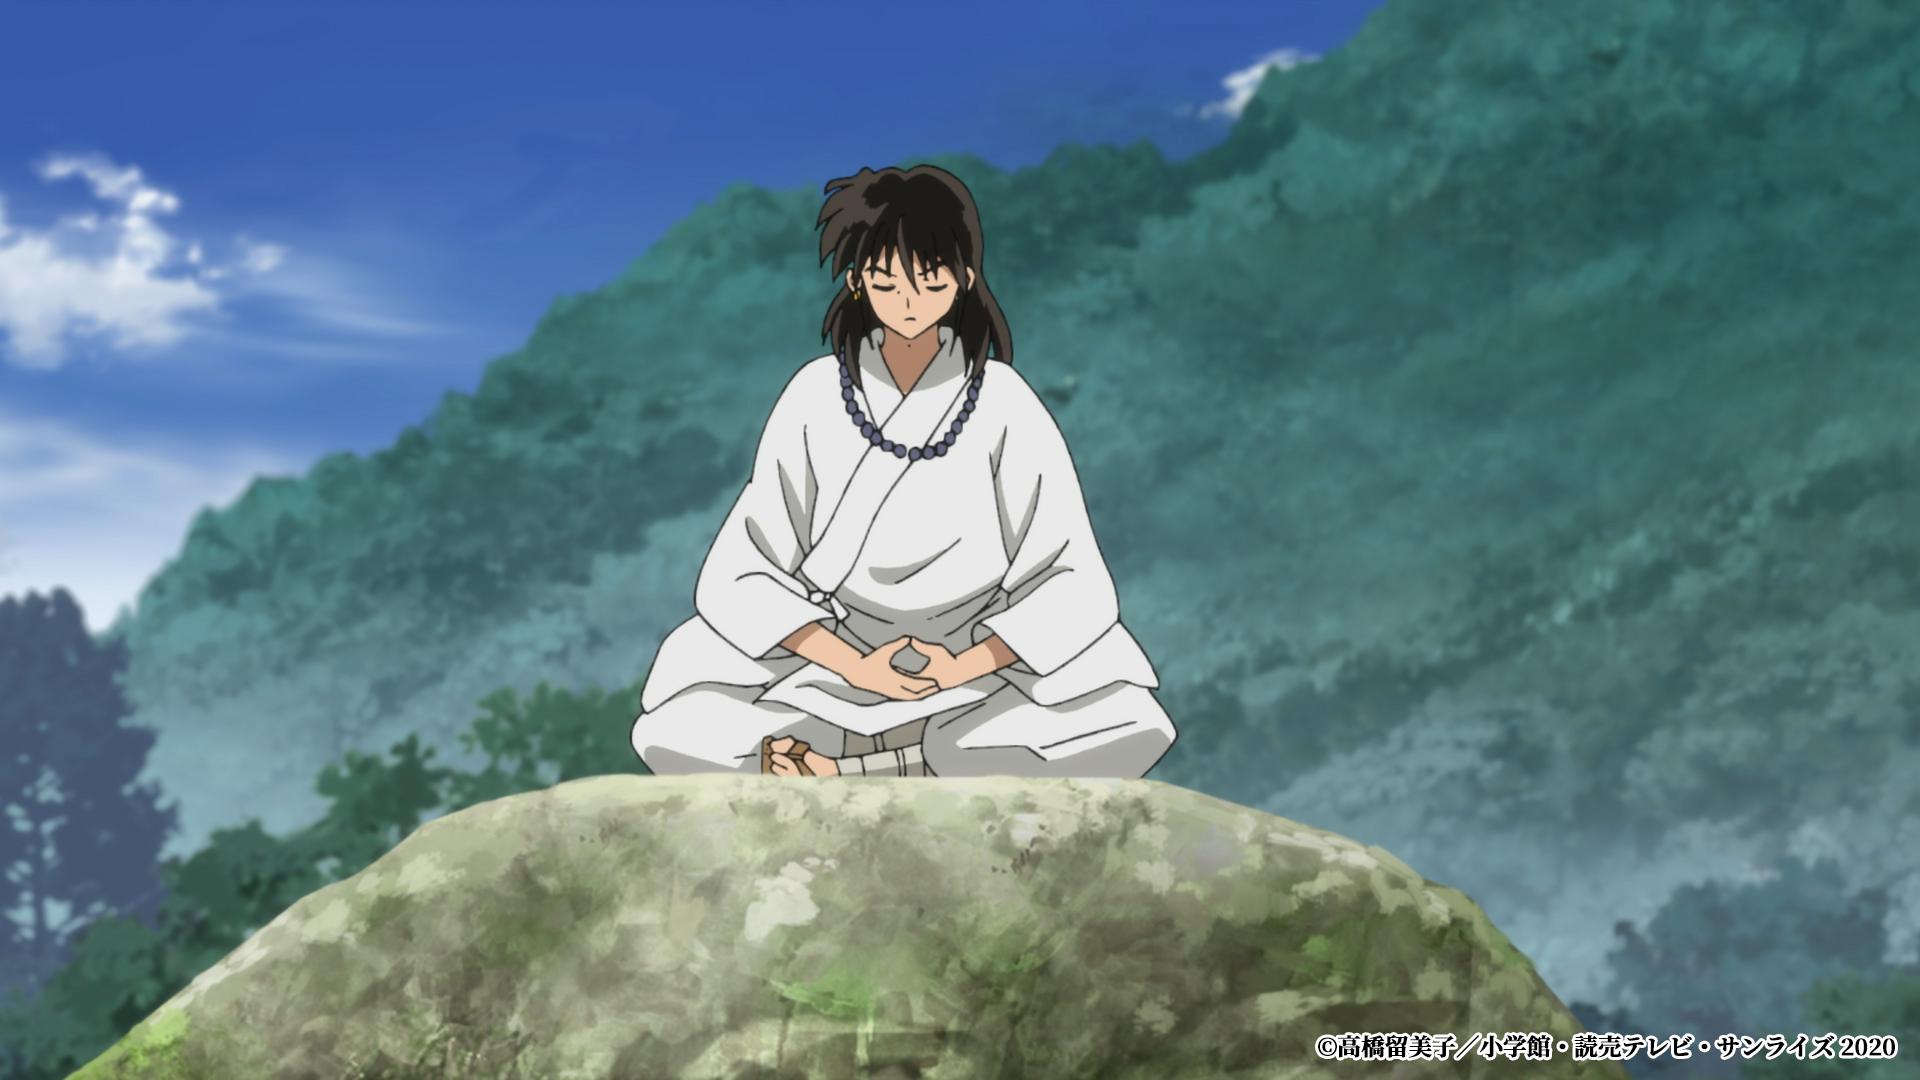 Sinopsis Hanyou no Yashahime Episode 13